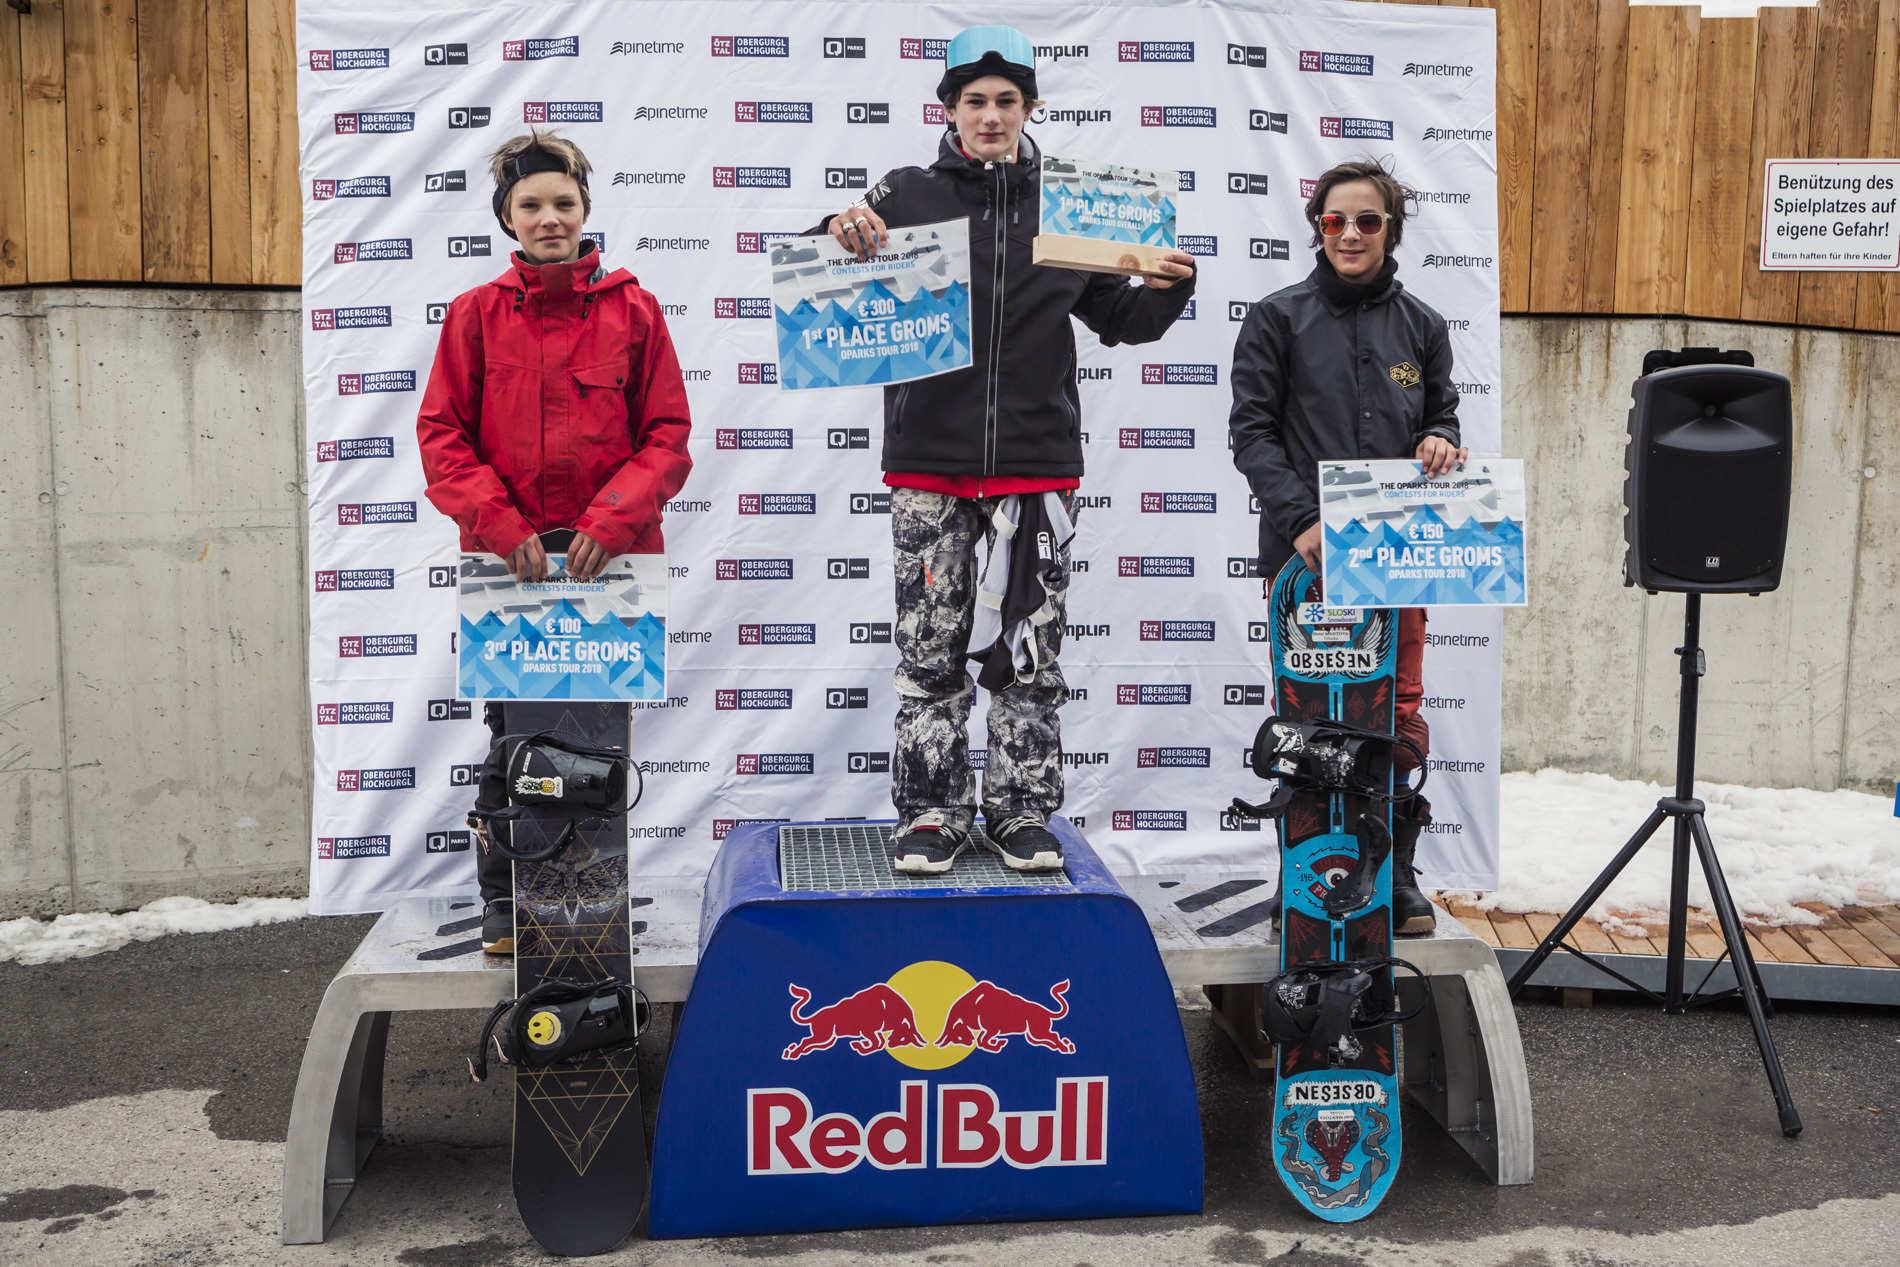 obergurgl tourfinale 15 04 2018 roland haschka qparks 019